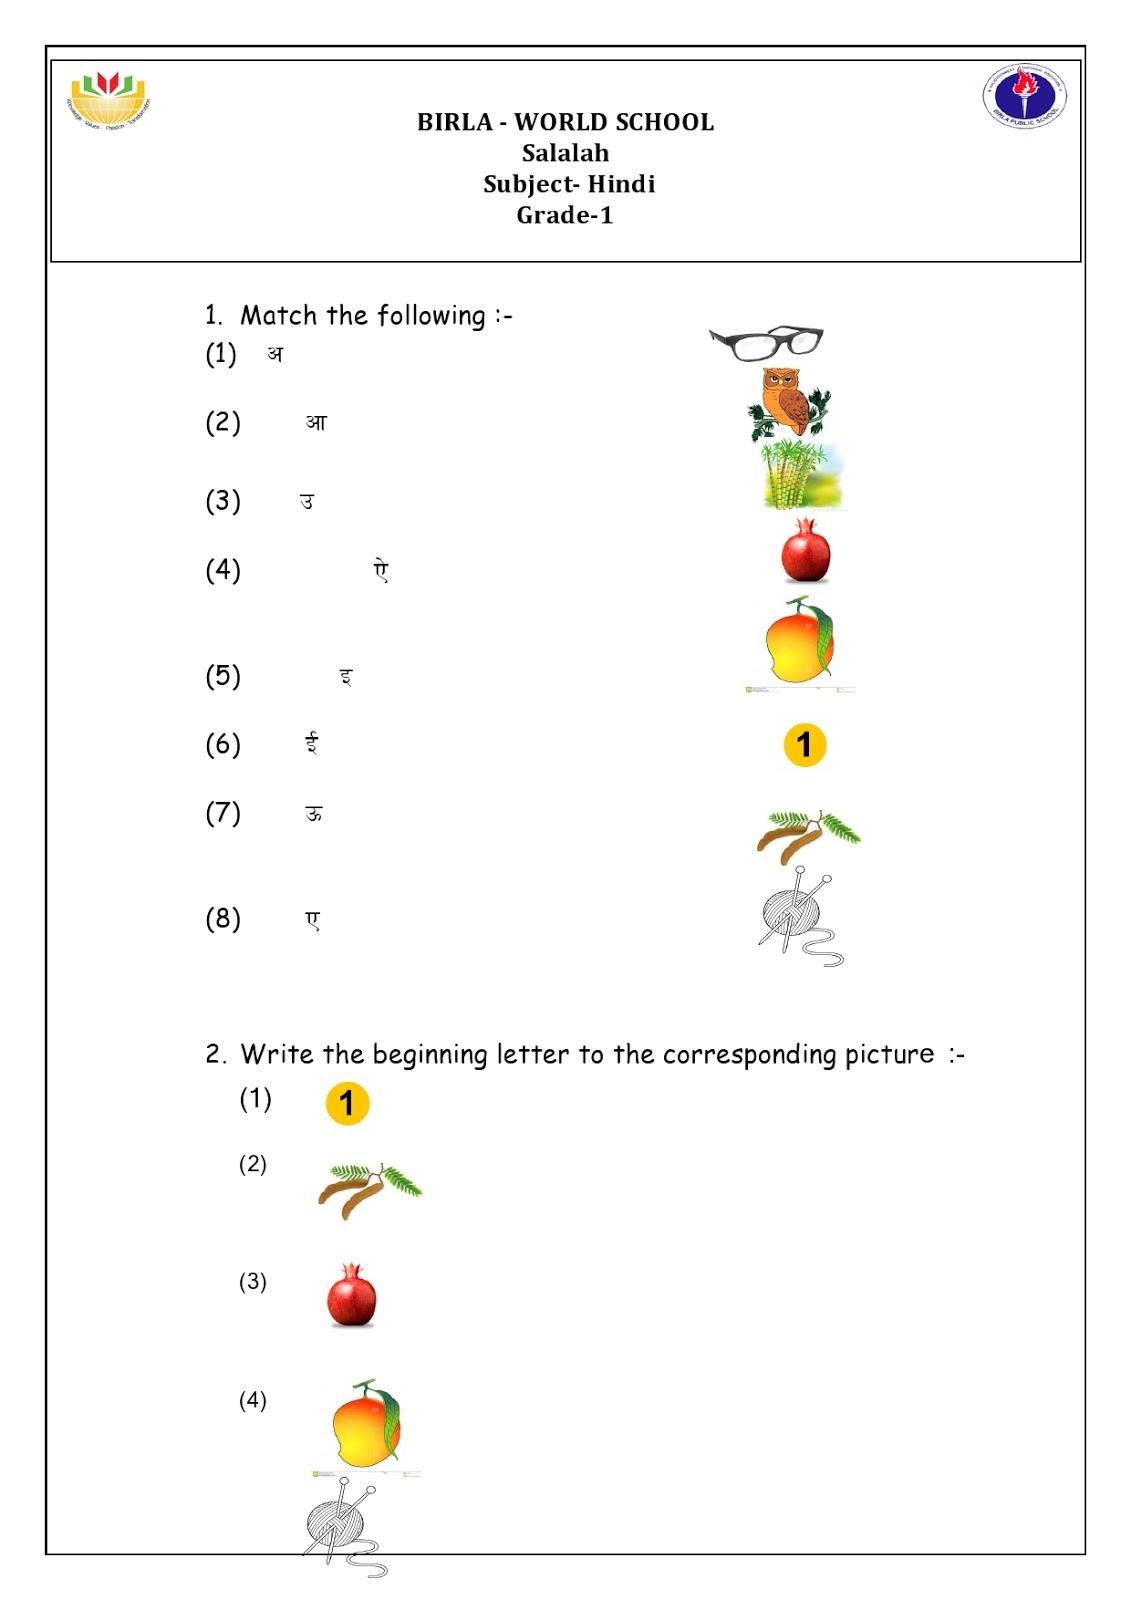 Workbooks letter b and d worksheets : Birla World School Oman: Homework for Grade 1 B and D on 18/08/16.